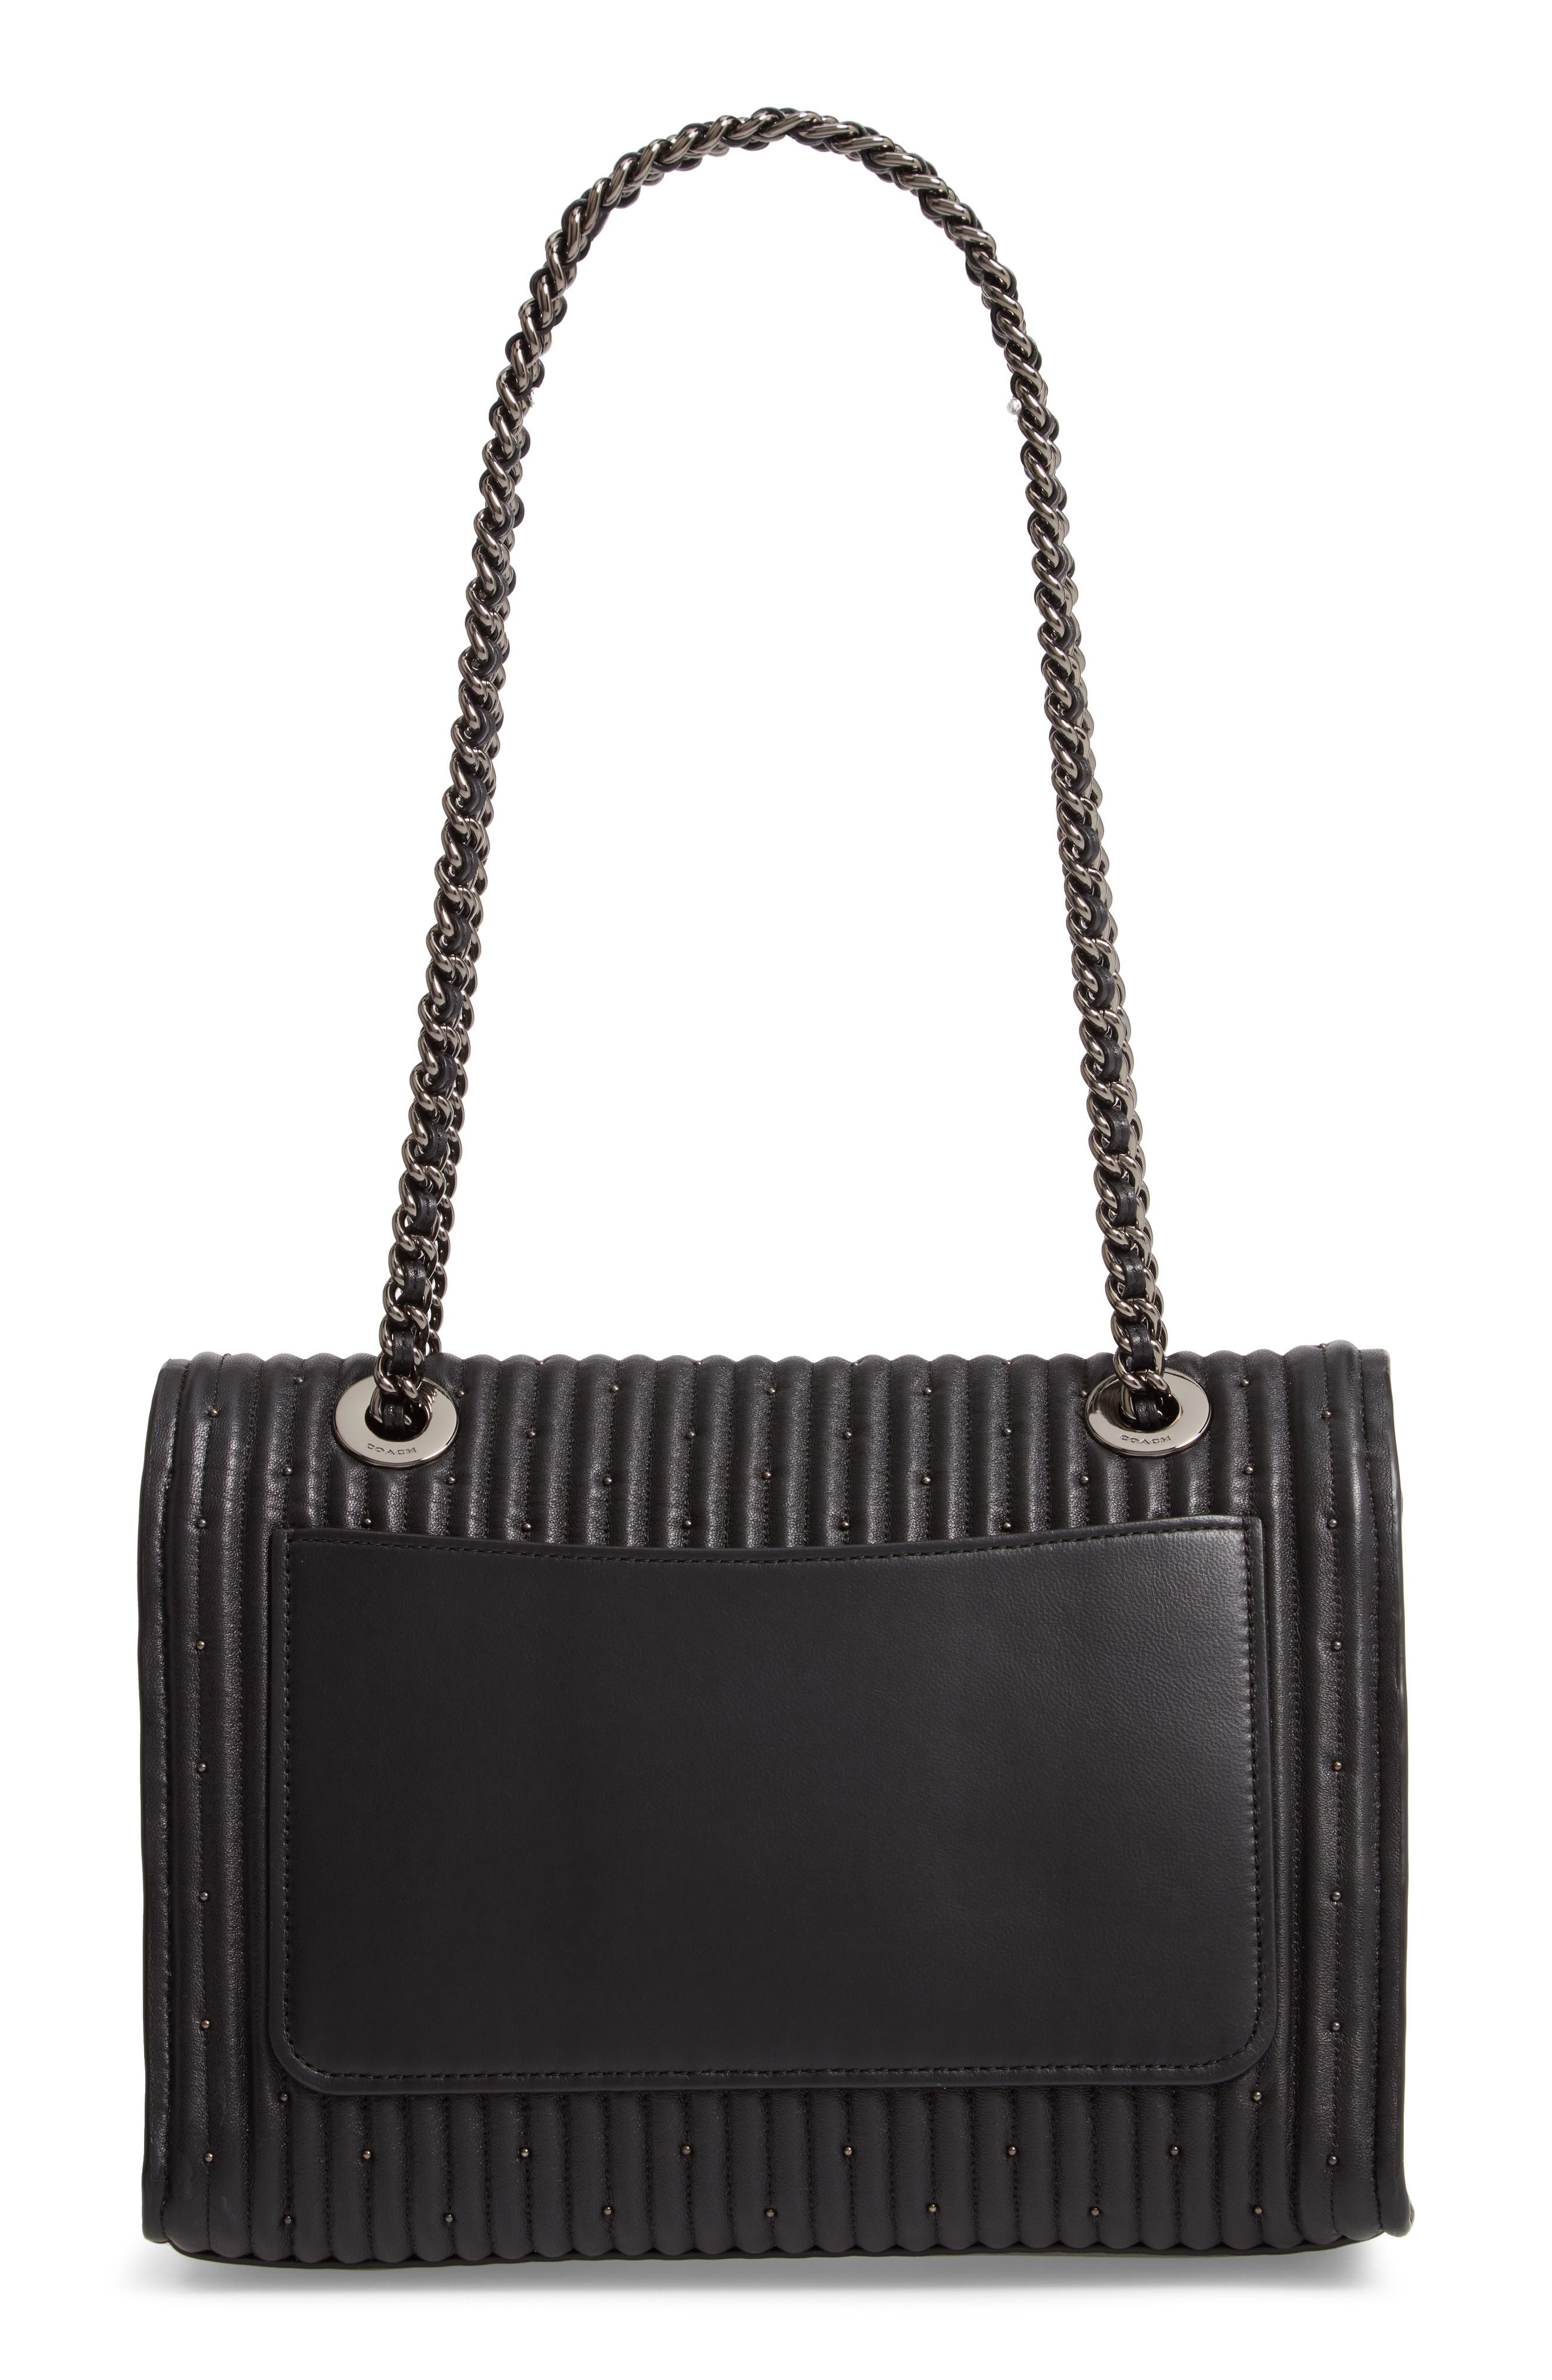 COACH, Parker Quilted Leather Shoulder Bag, Alternate thumbnail 4, color, BLACK